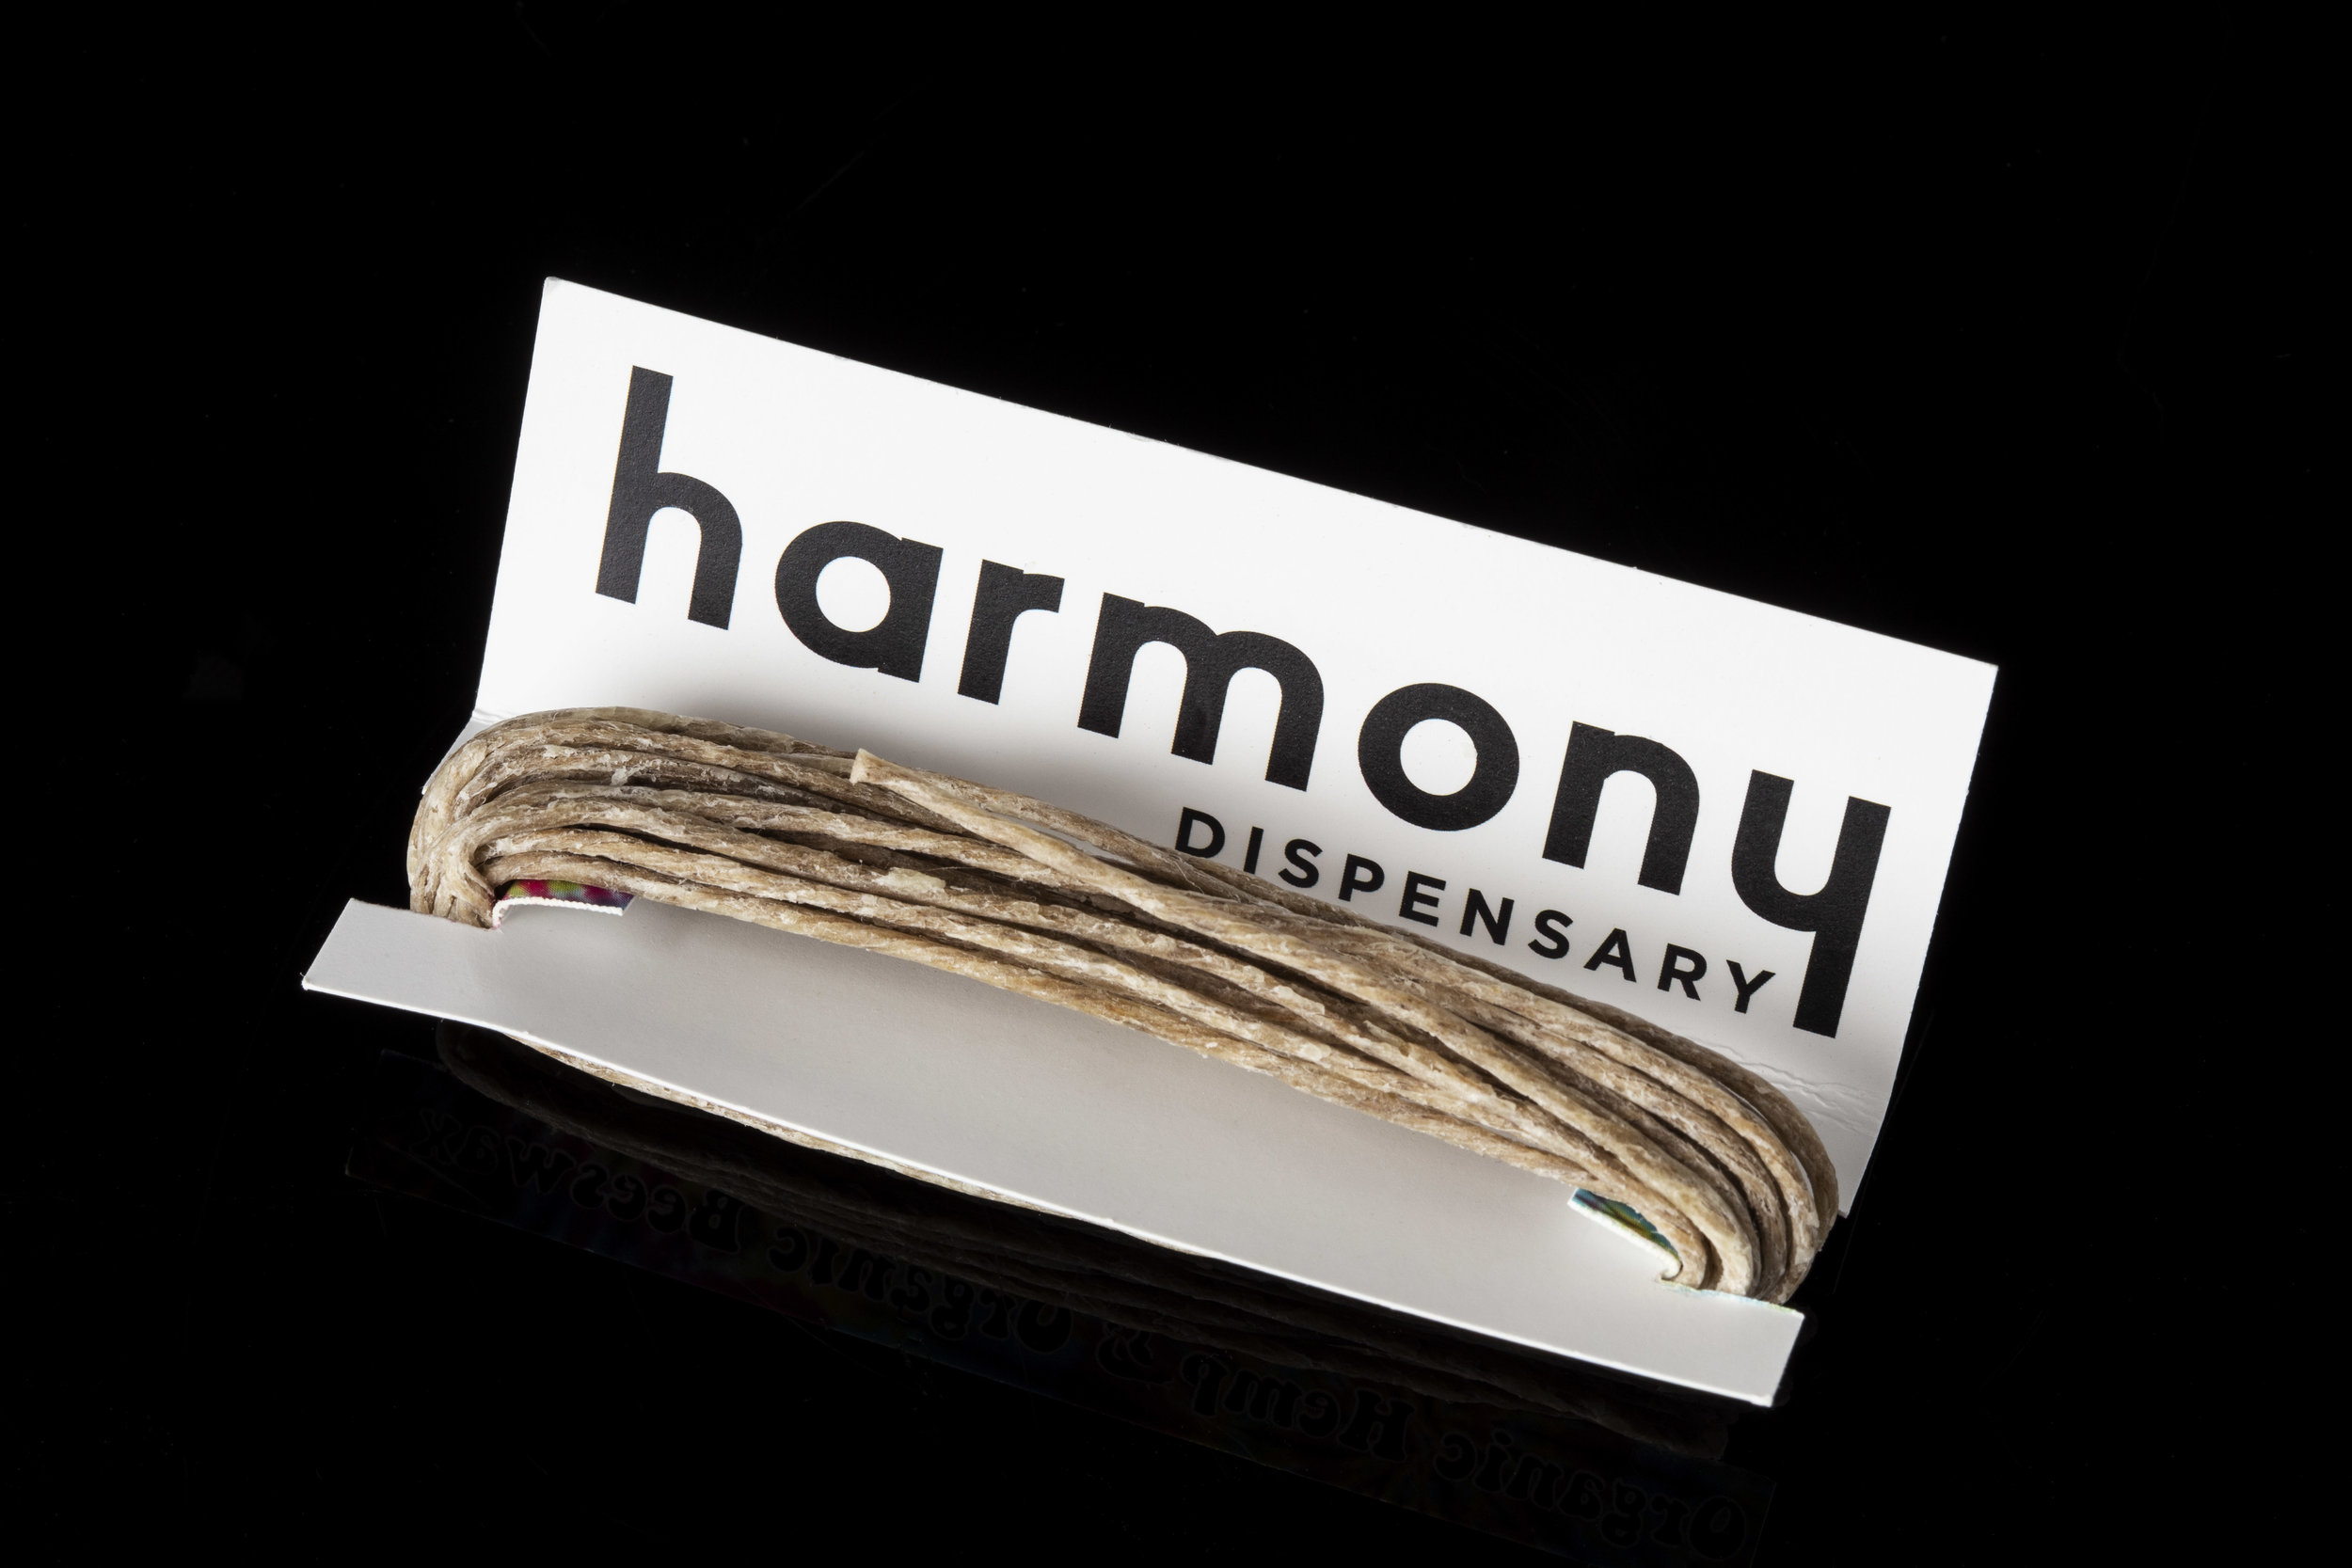 2019_03_15_HEMPWICK_Glass_Pipe_Cultivation_Flowering_Harmony_Dispensary_Cannabis_Marijuana_07.jpg